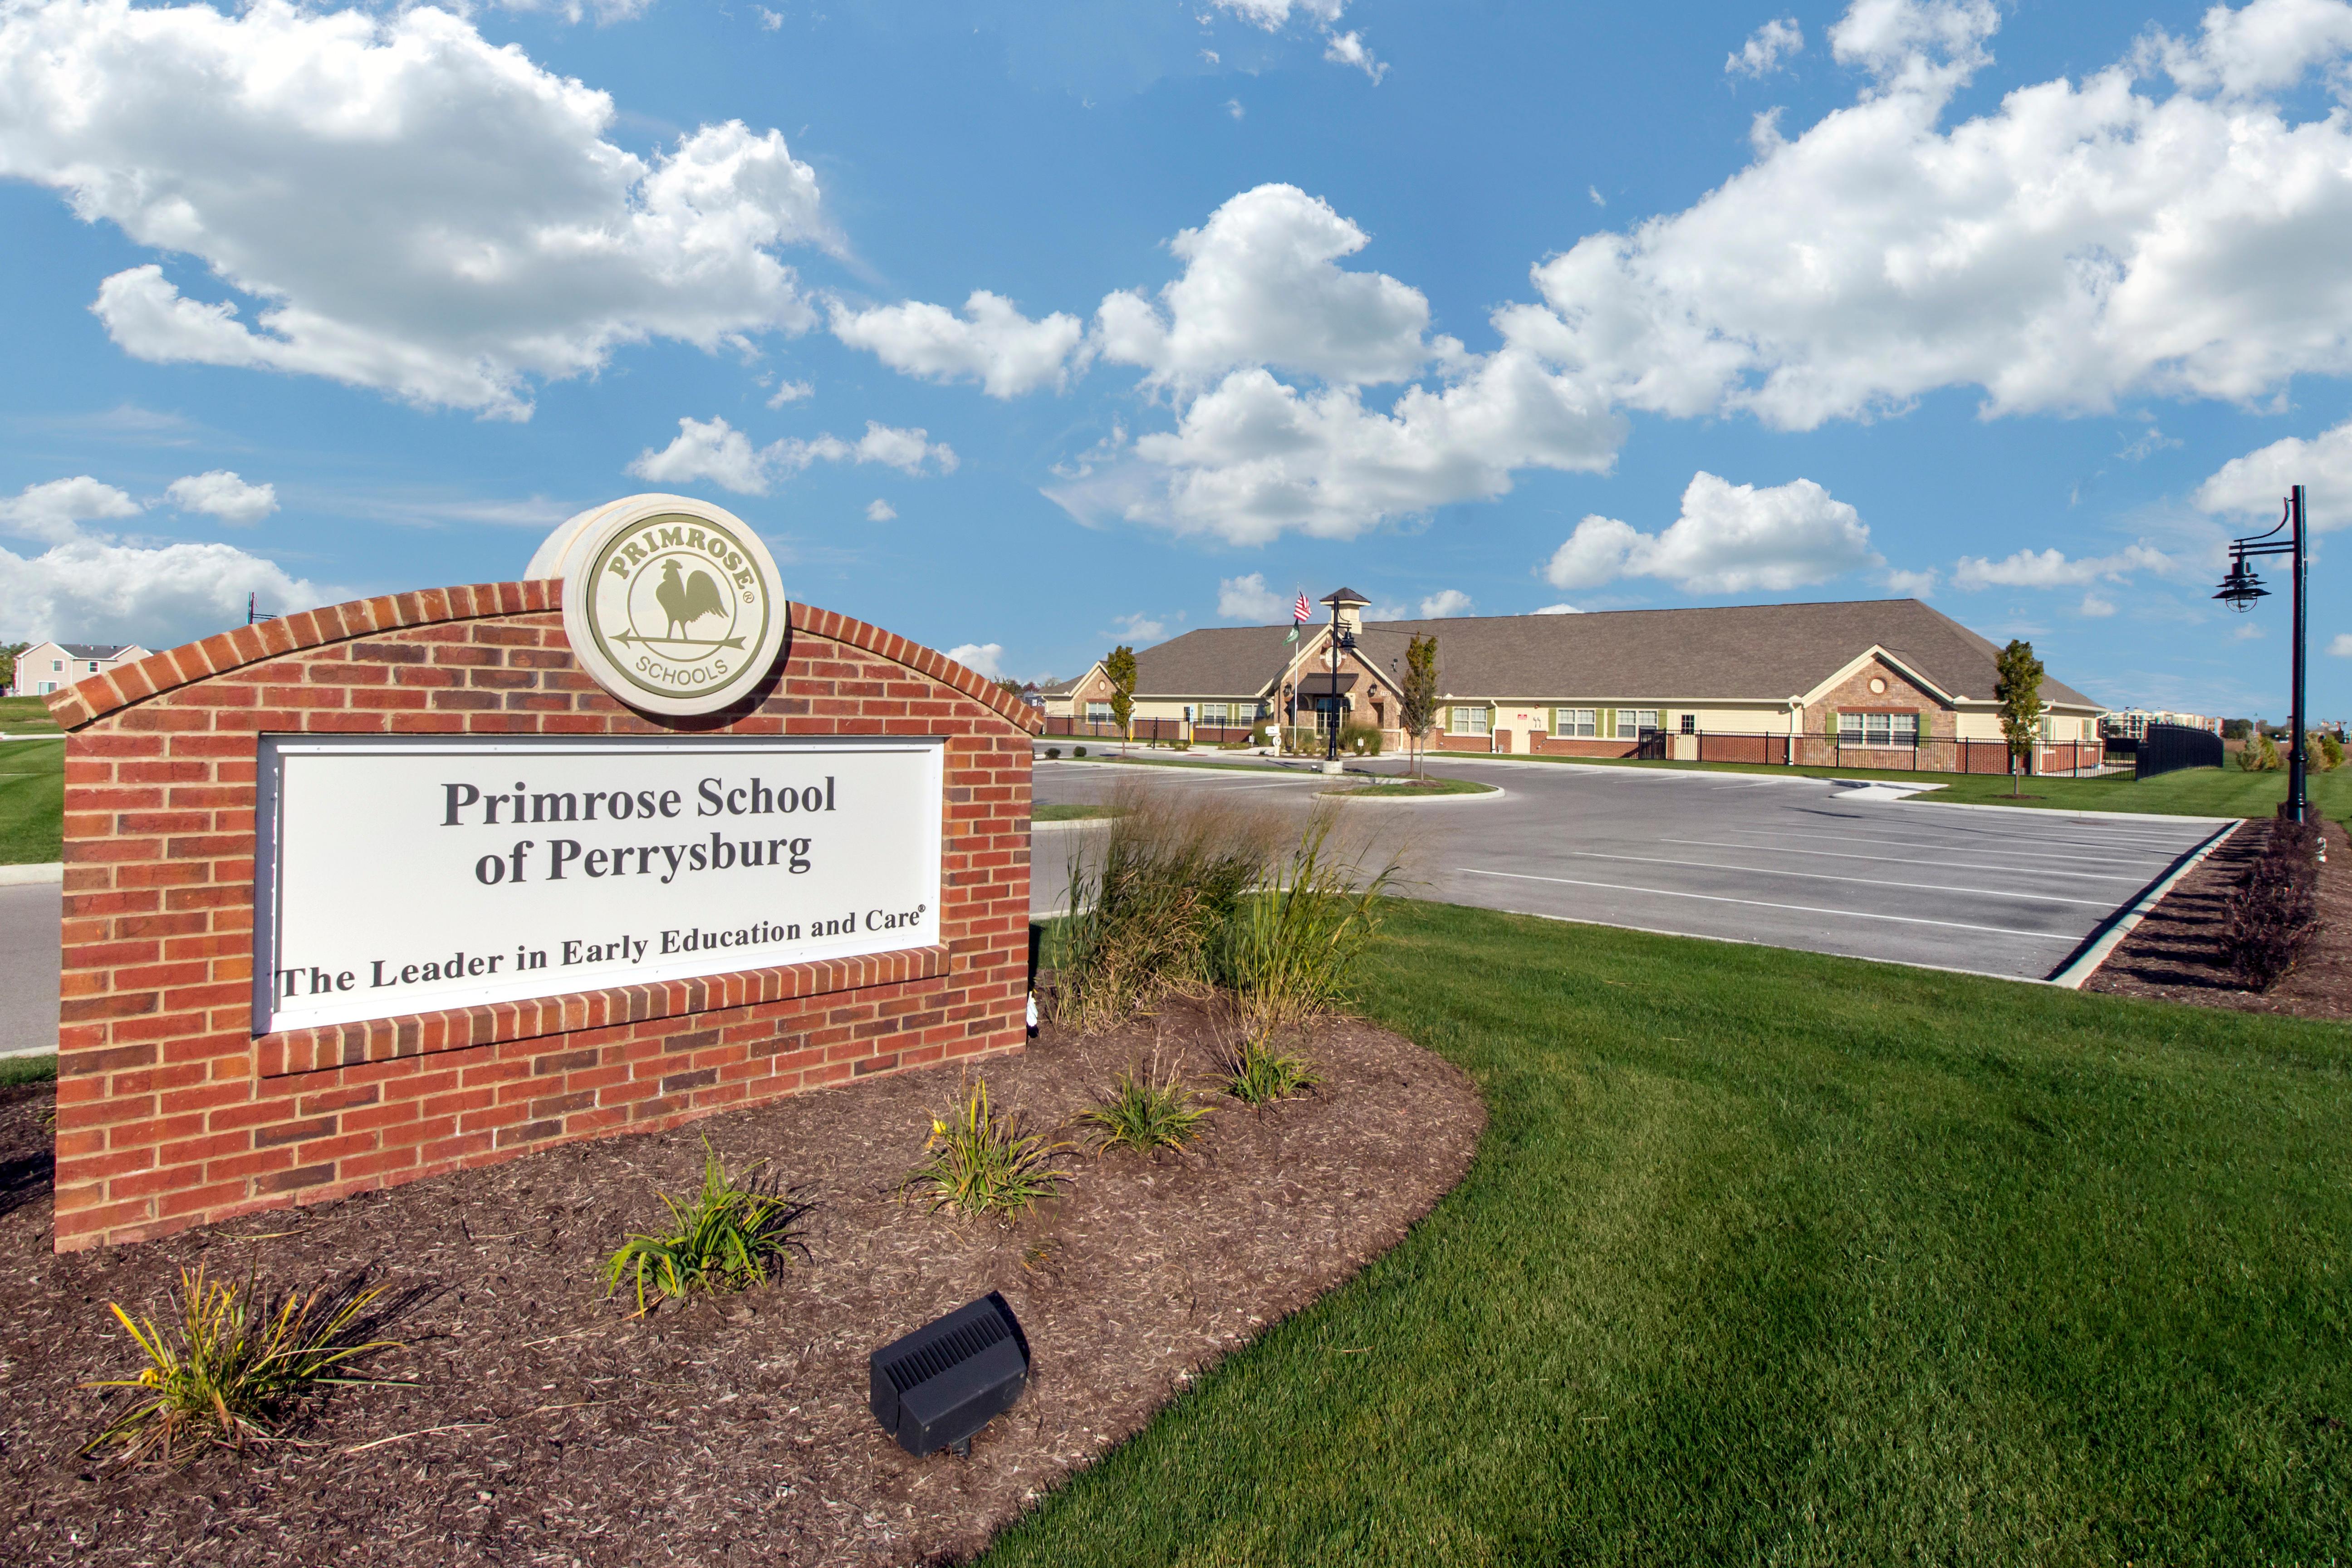 Primrose School of Perrysburg image 12